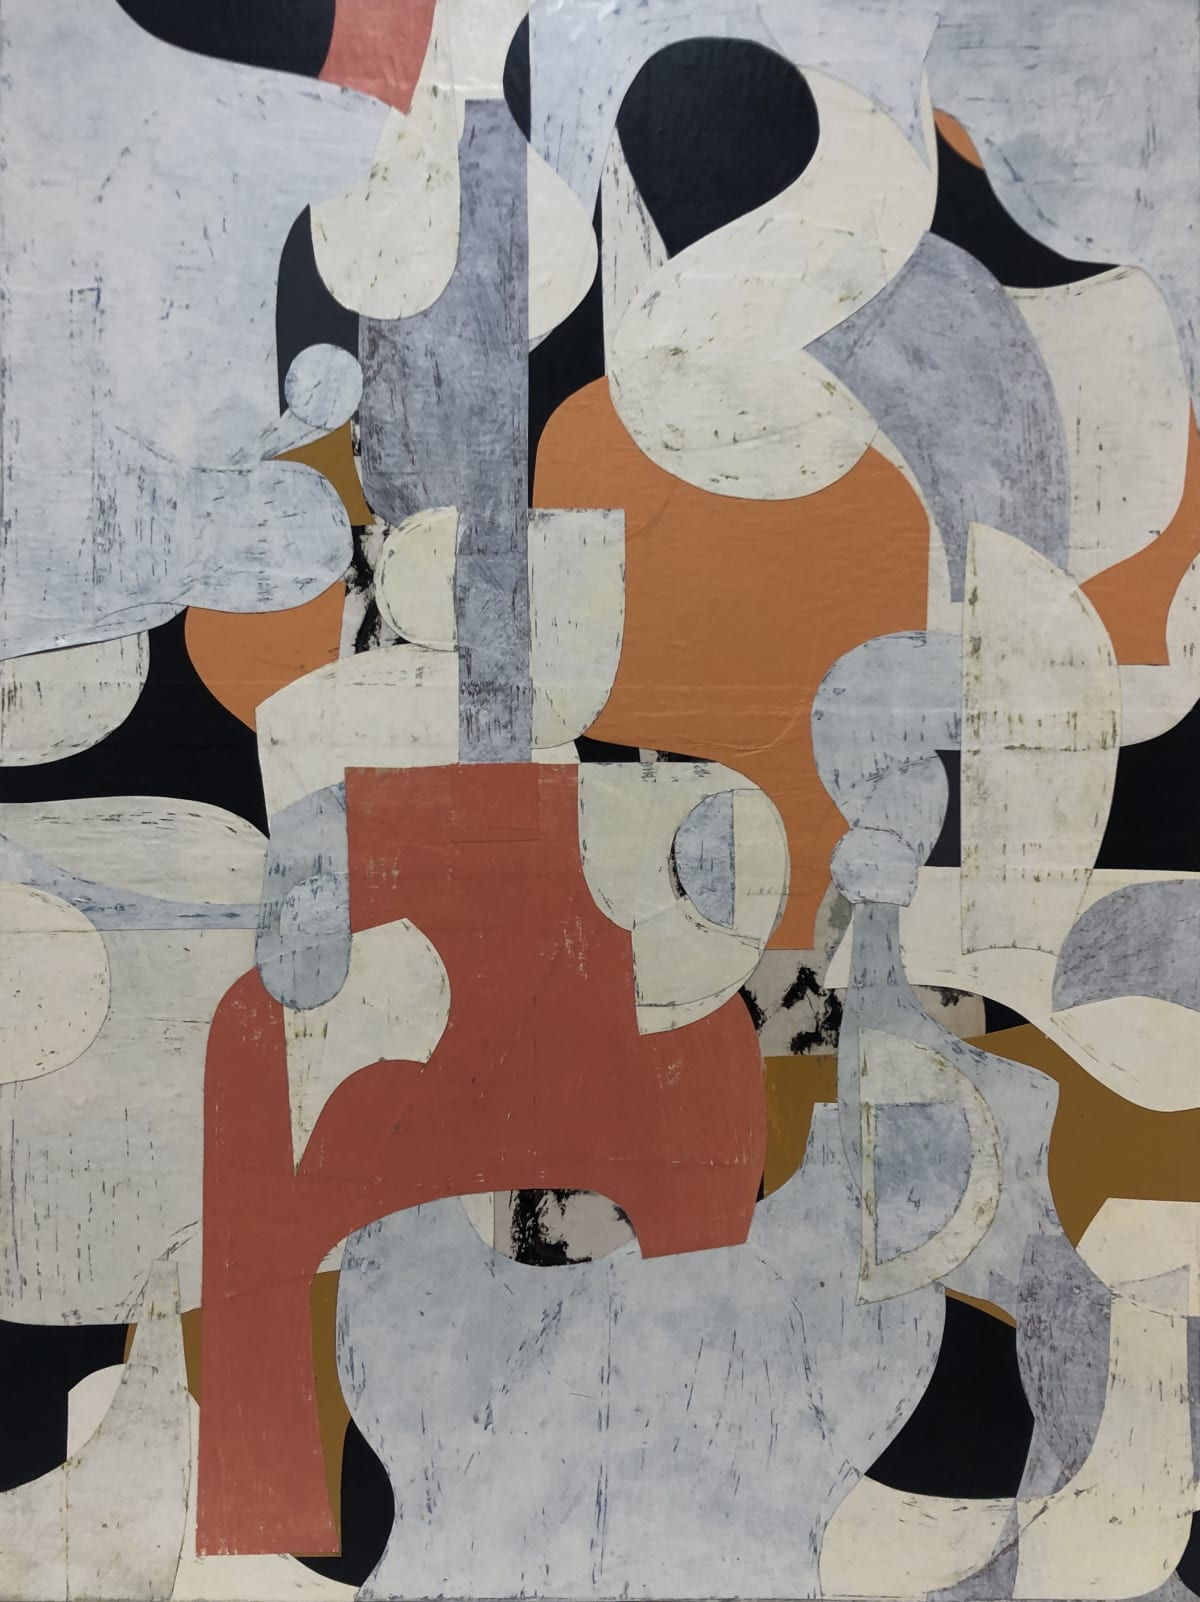 Daniel Anselmi, Untitled (3-10), 2017